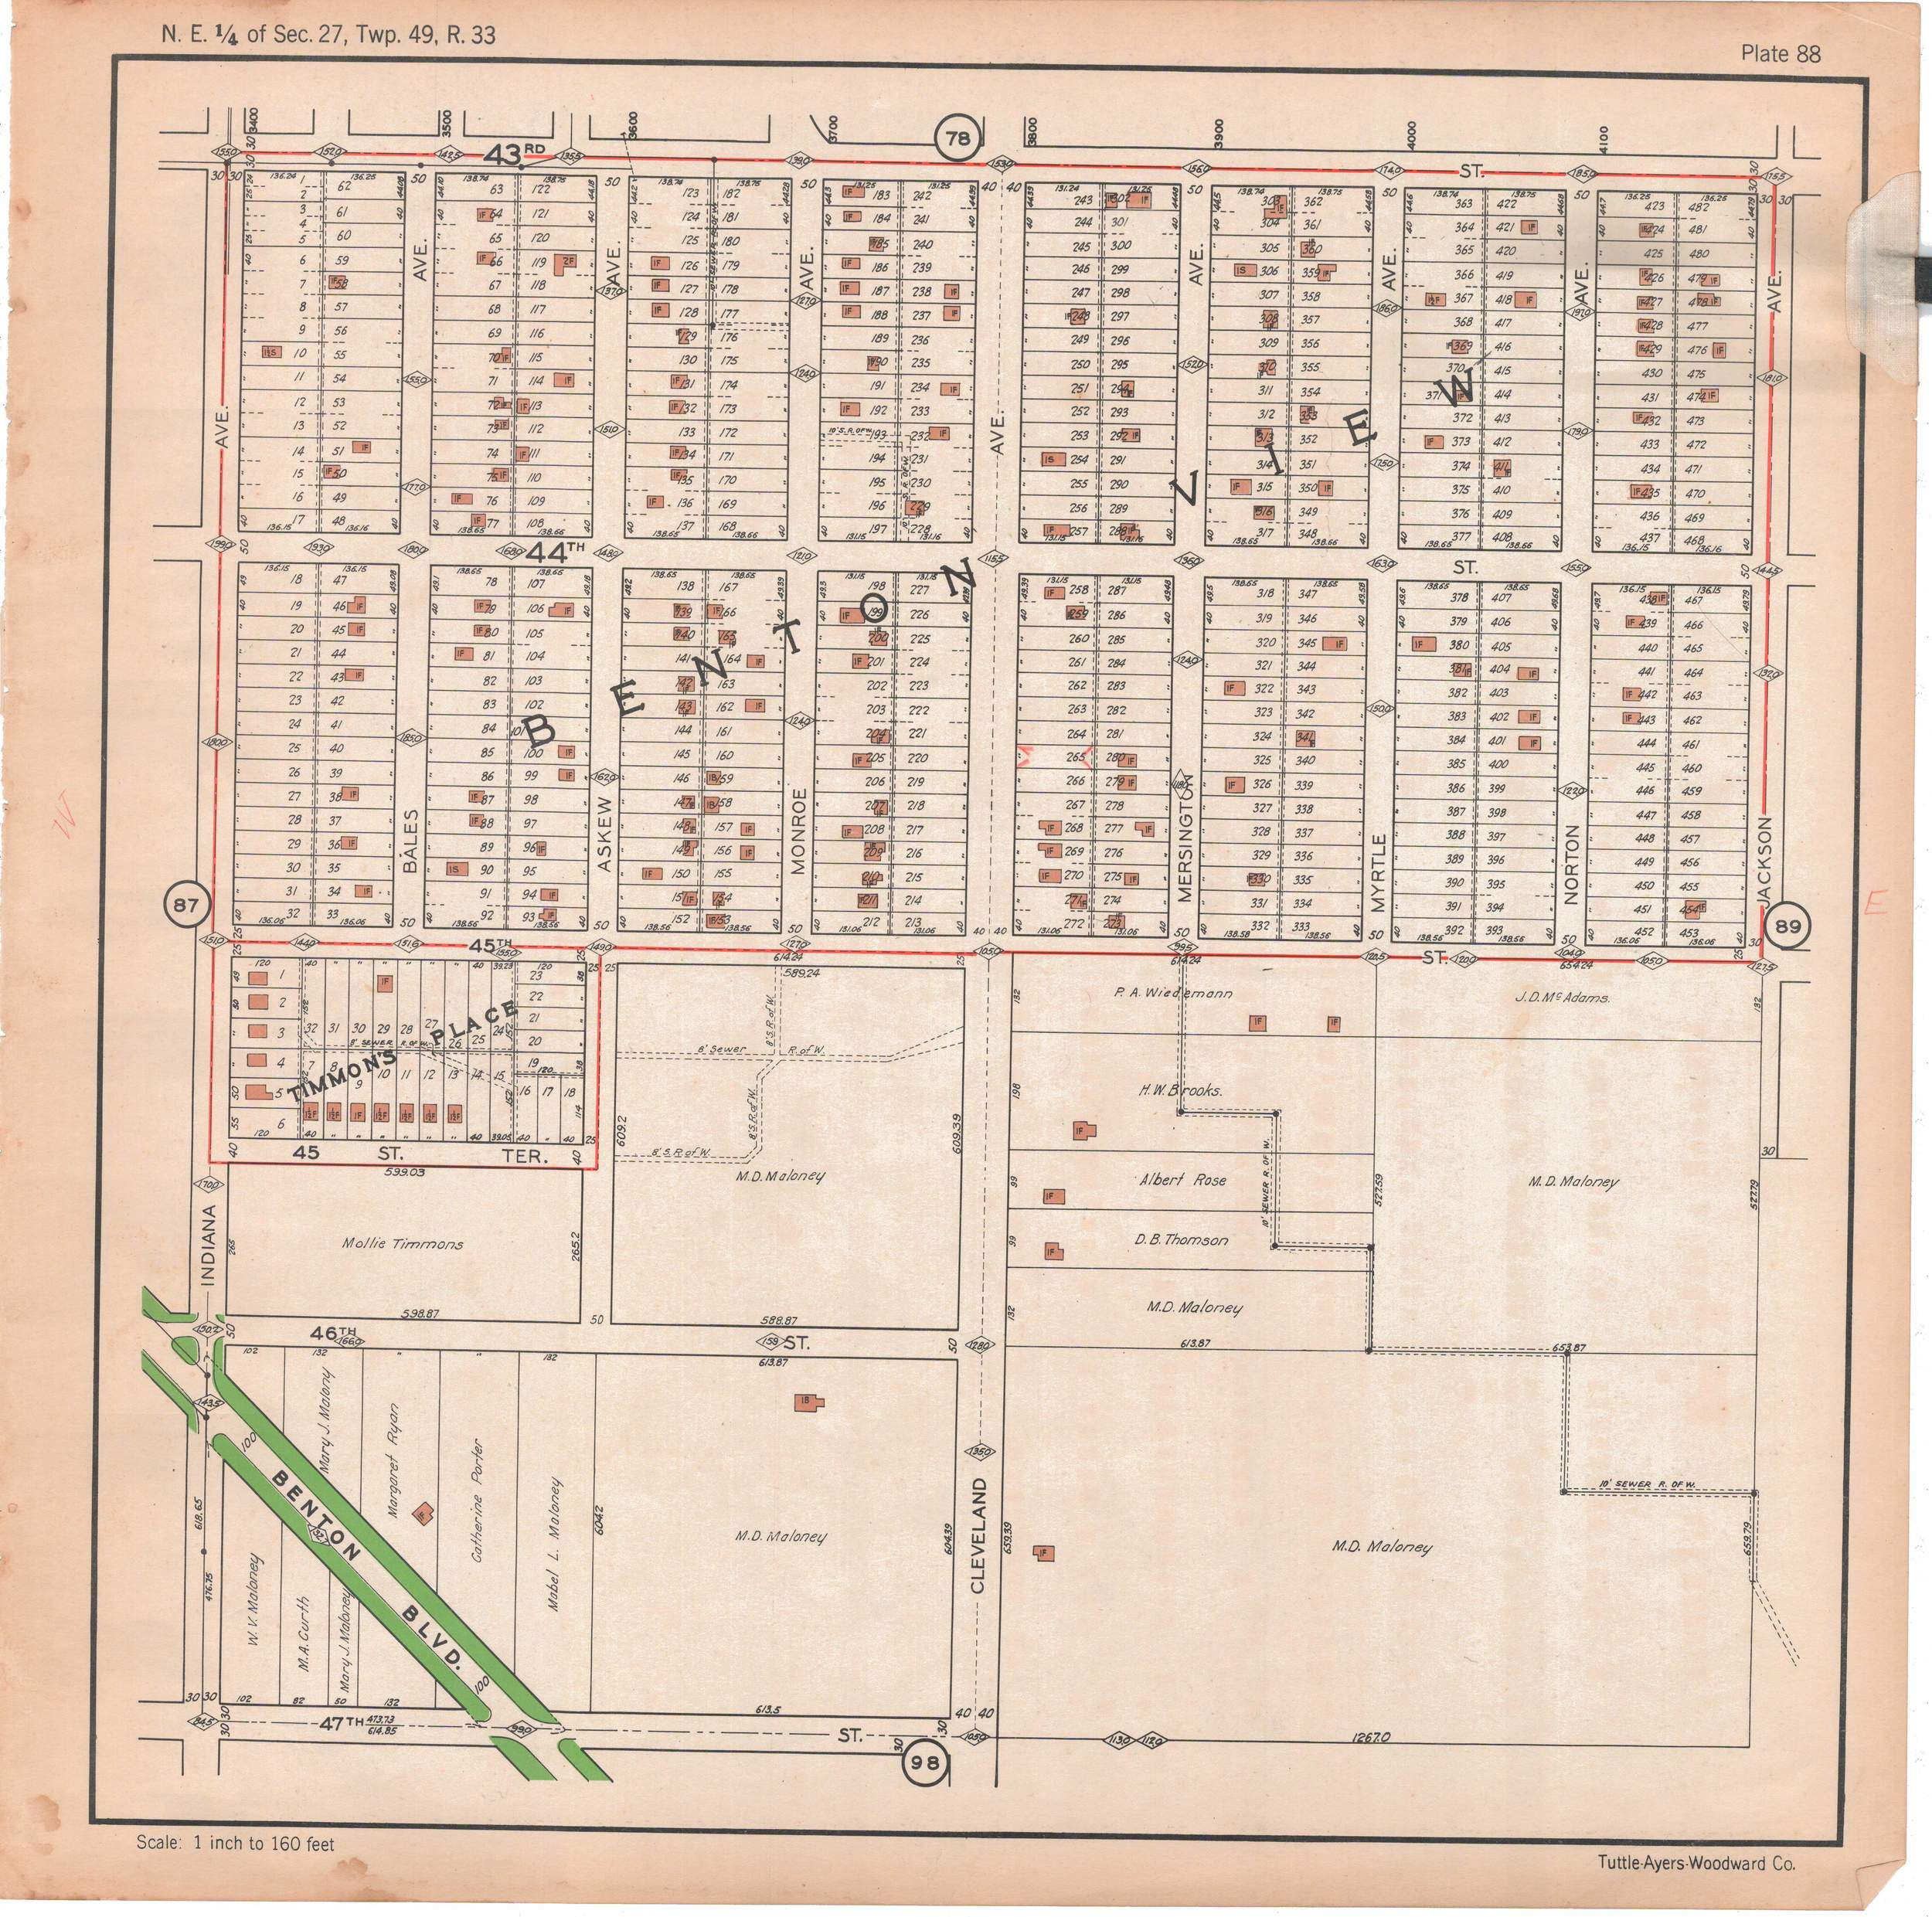 1925 TUTTLE_AYERS_Plate 88.JPG